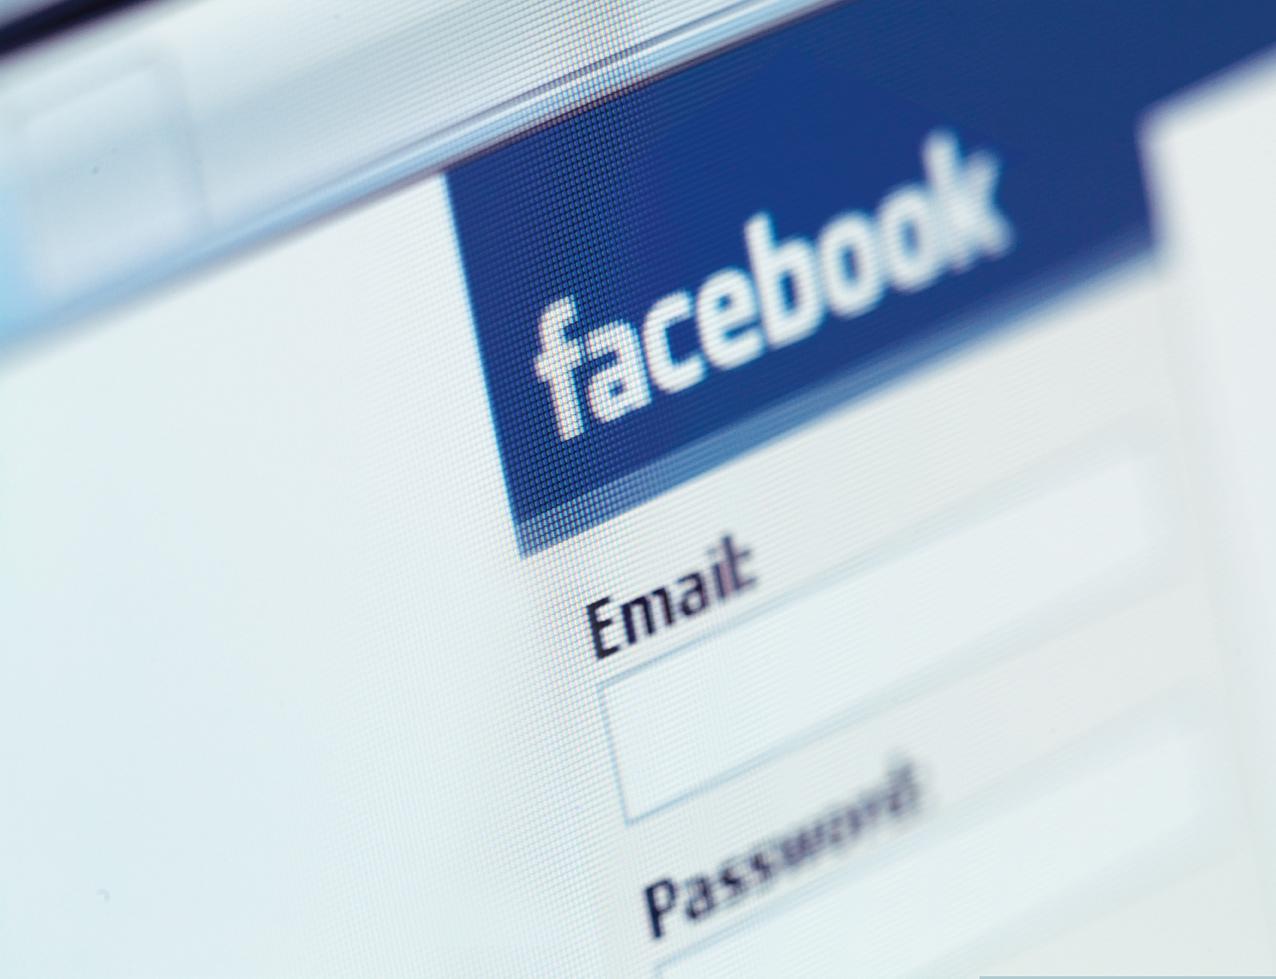 virus no facebook, conheça os cuidados